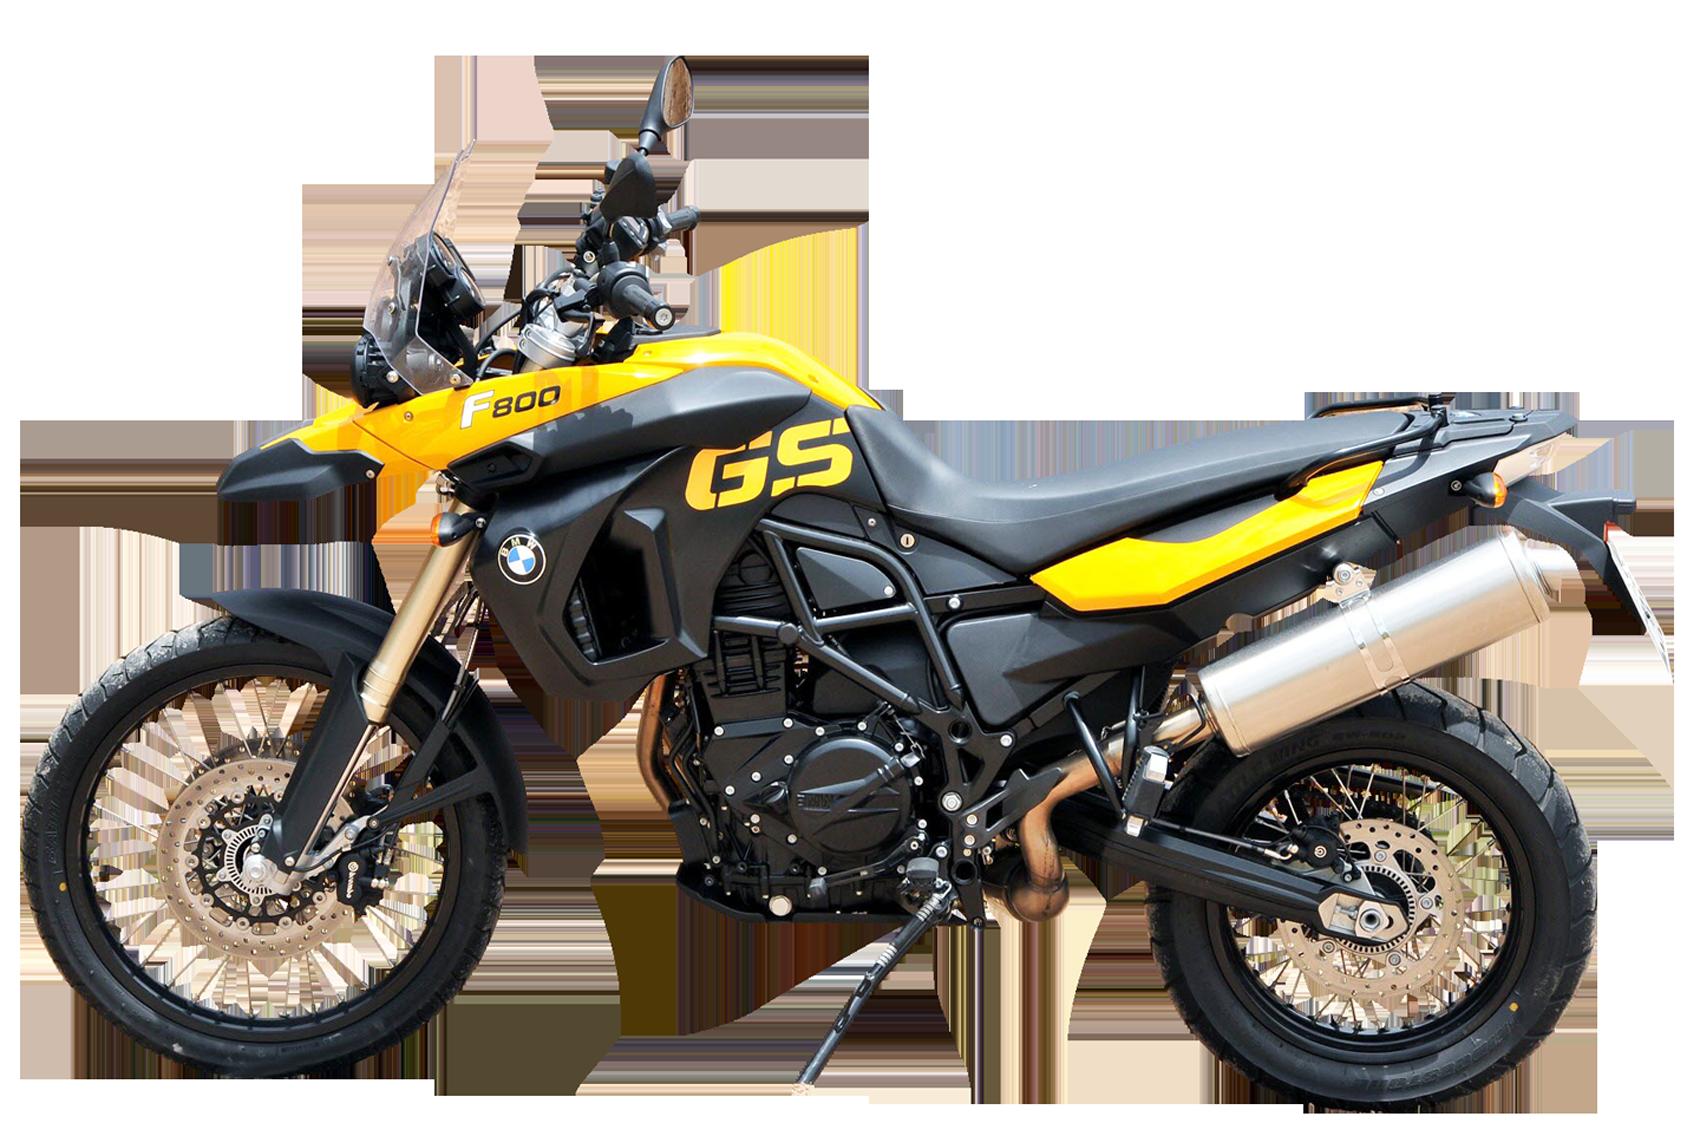 Bmw F800gs Png Image Bmw Motorrad Bmw Motorcycle